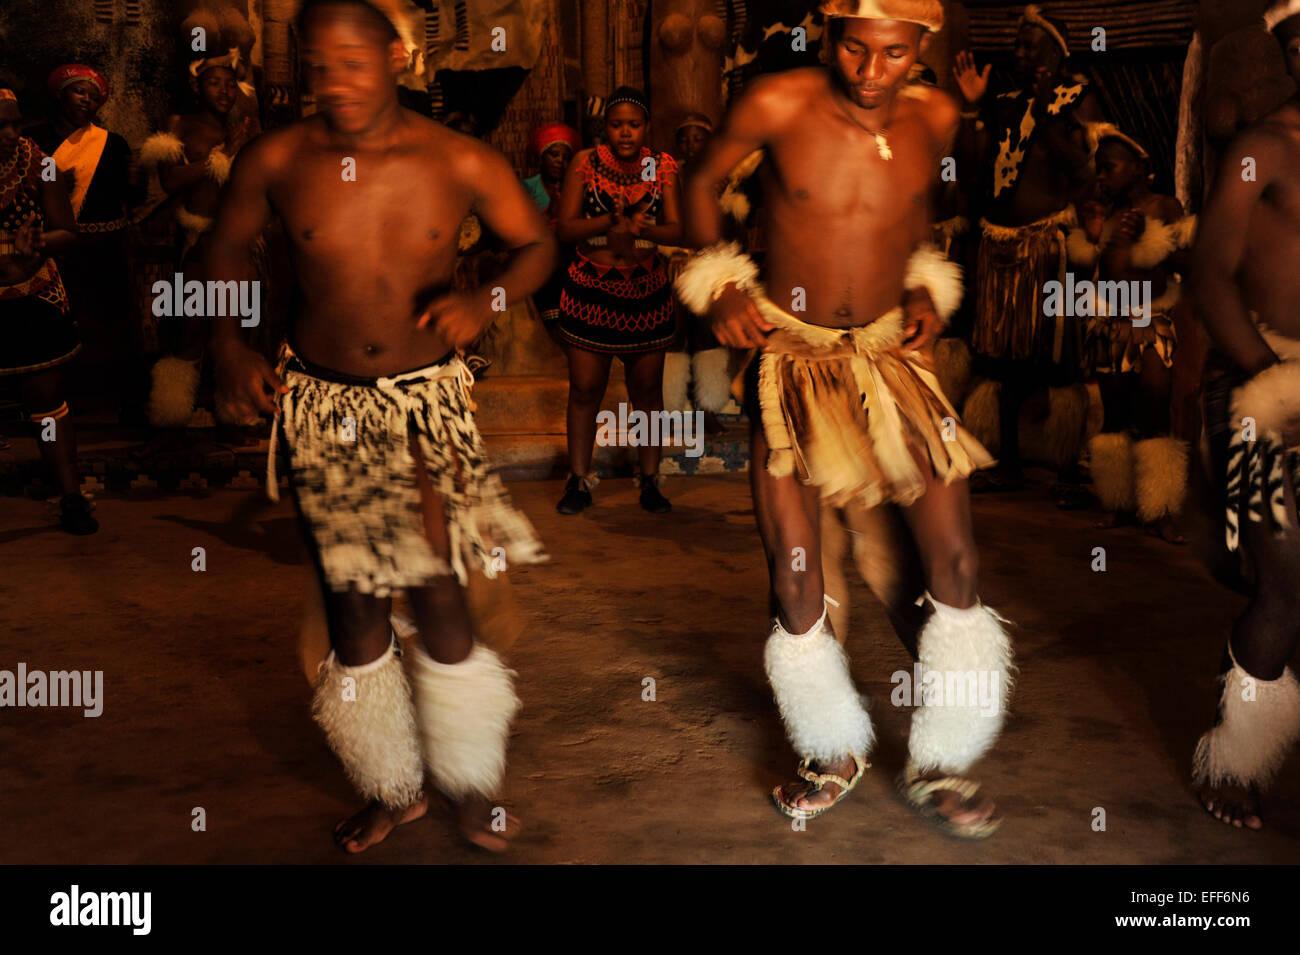 Zulu traditional dress in zulu kraal kwazulu natal - Two Male Traditional Zulu Dancers In Ceremonial Costume Entertaining Tourists At Shakaland Kwazulu Natal South